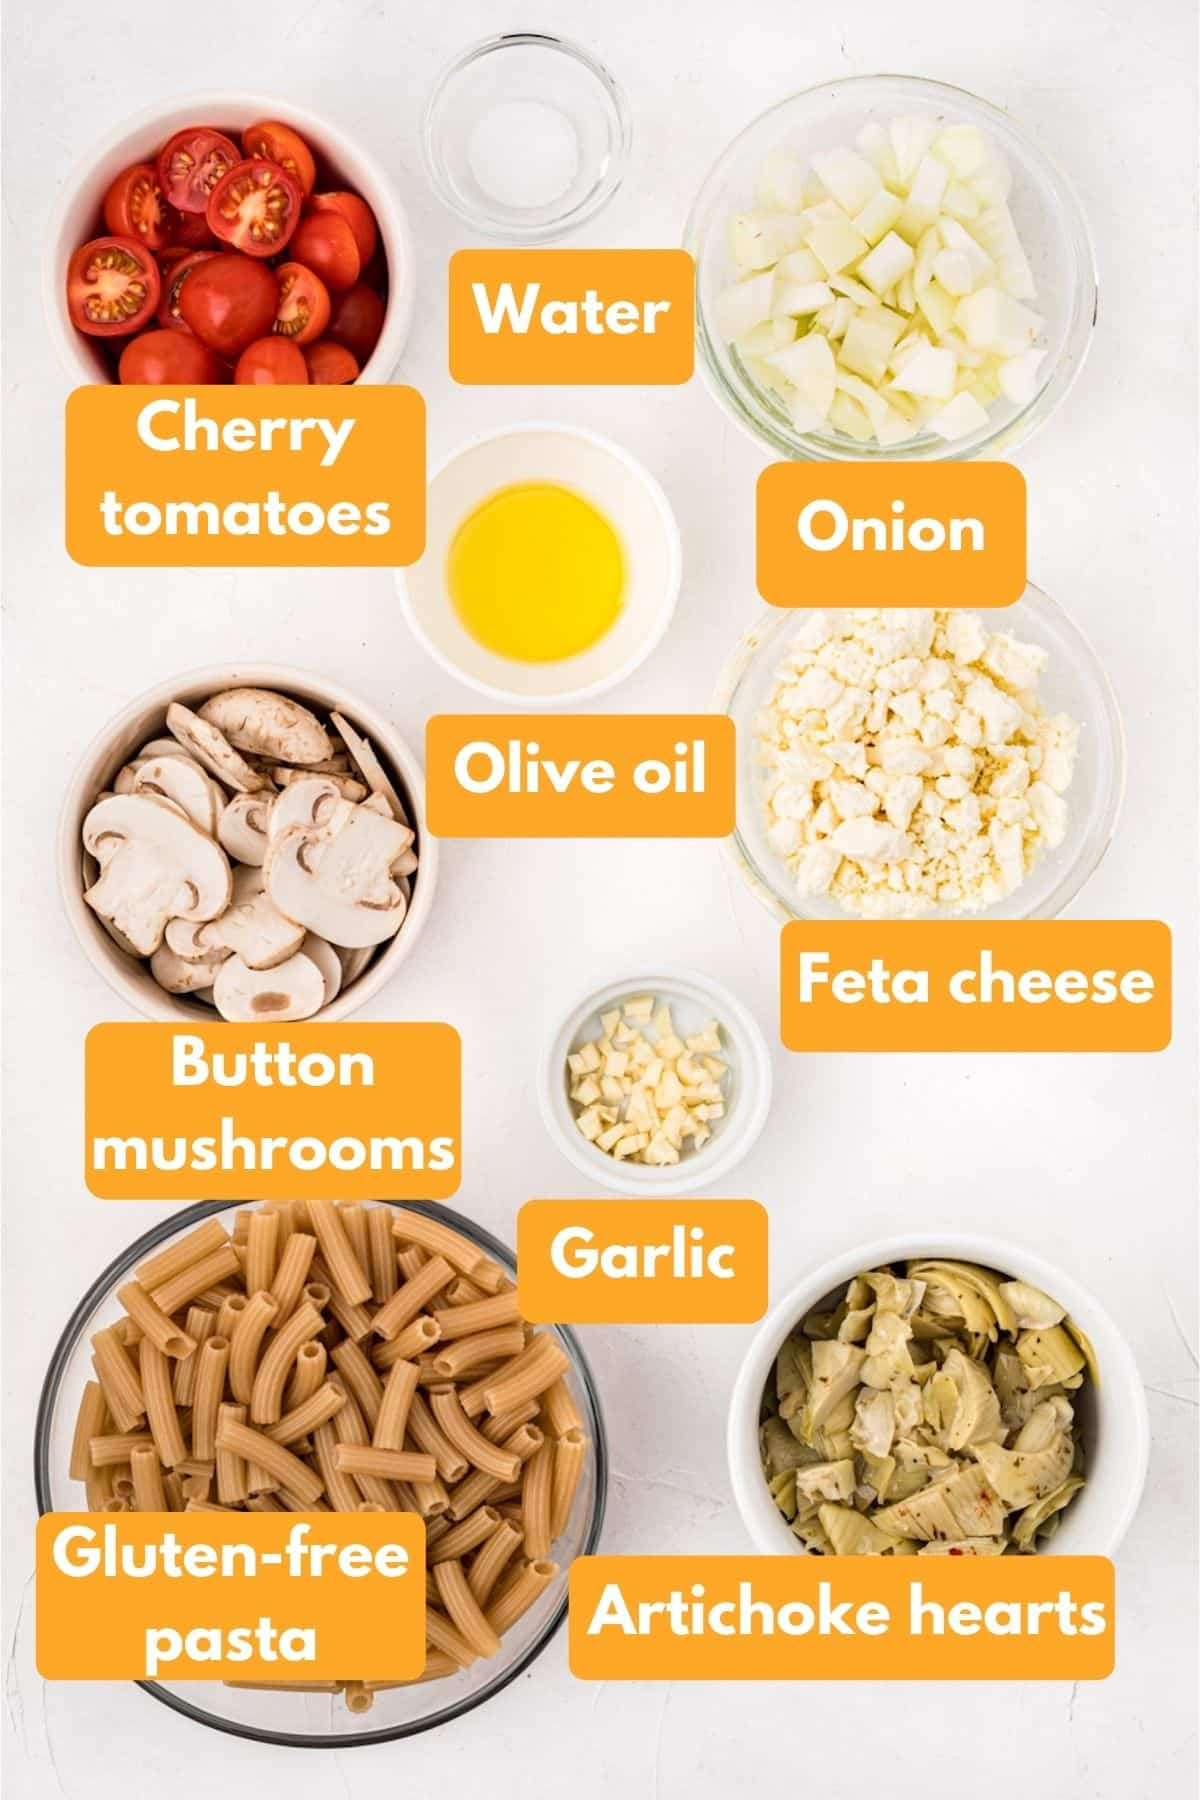 ingredients for gluten free pasta with veggies